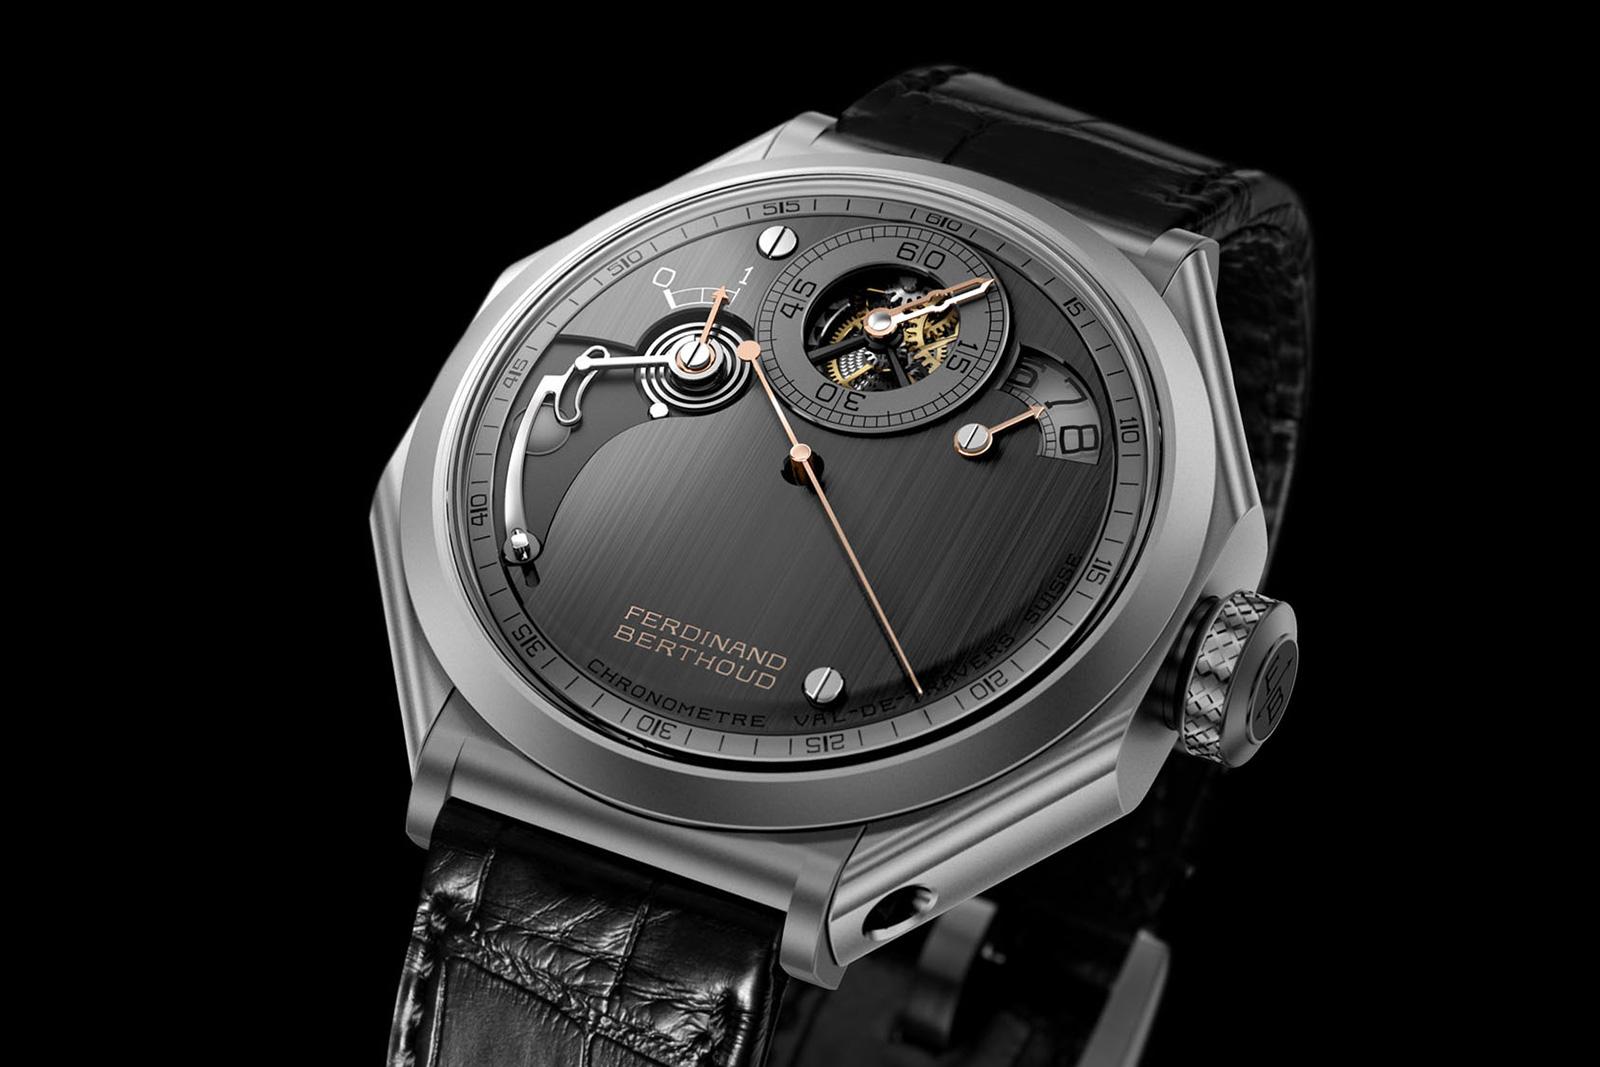 Chronometre Ferdinand Berthoud FB 1R.6-1